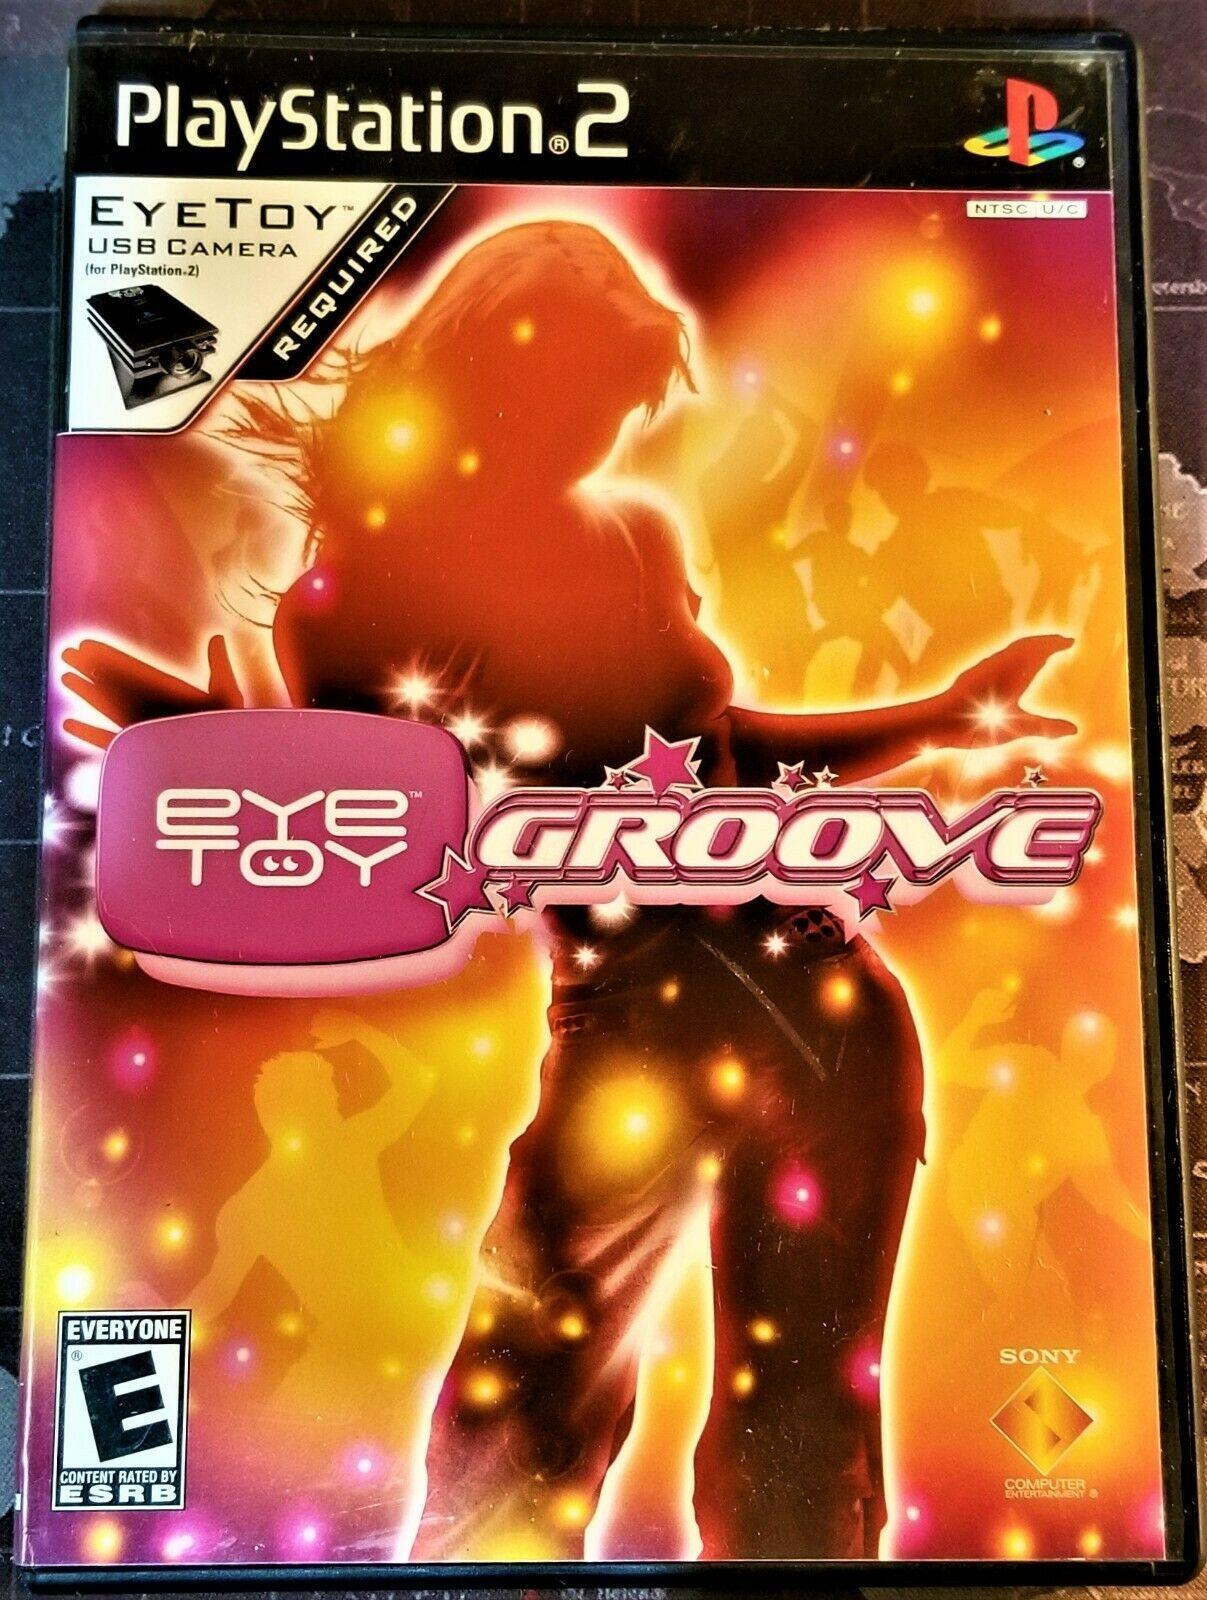 Eyetoy Groove Sony Playstation 2 2004 711719734529 Ebay In 2021 Playstation Playstation 2 Sony Playstation